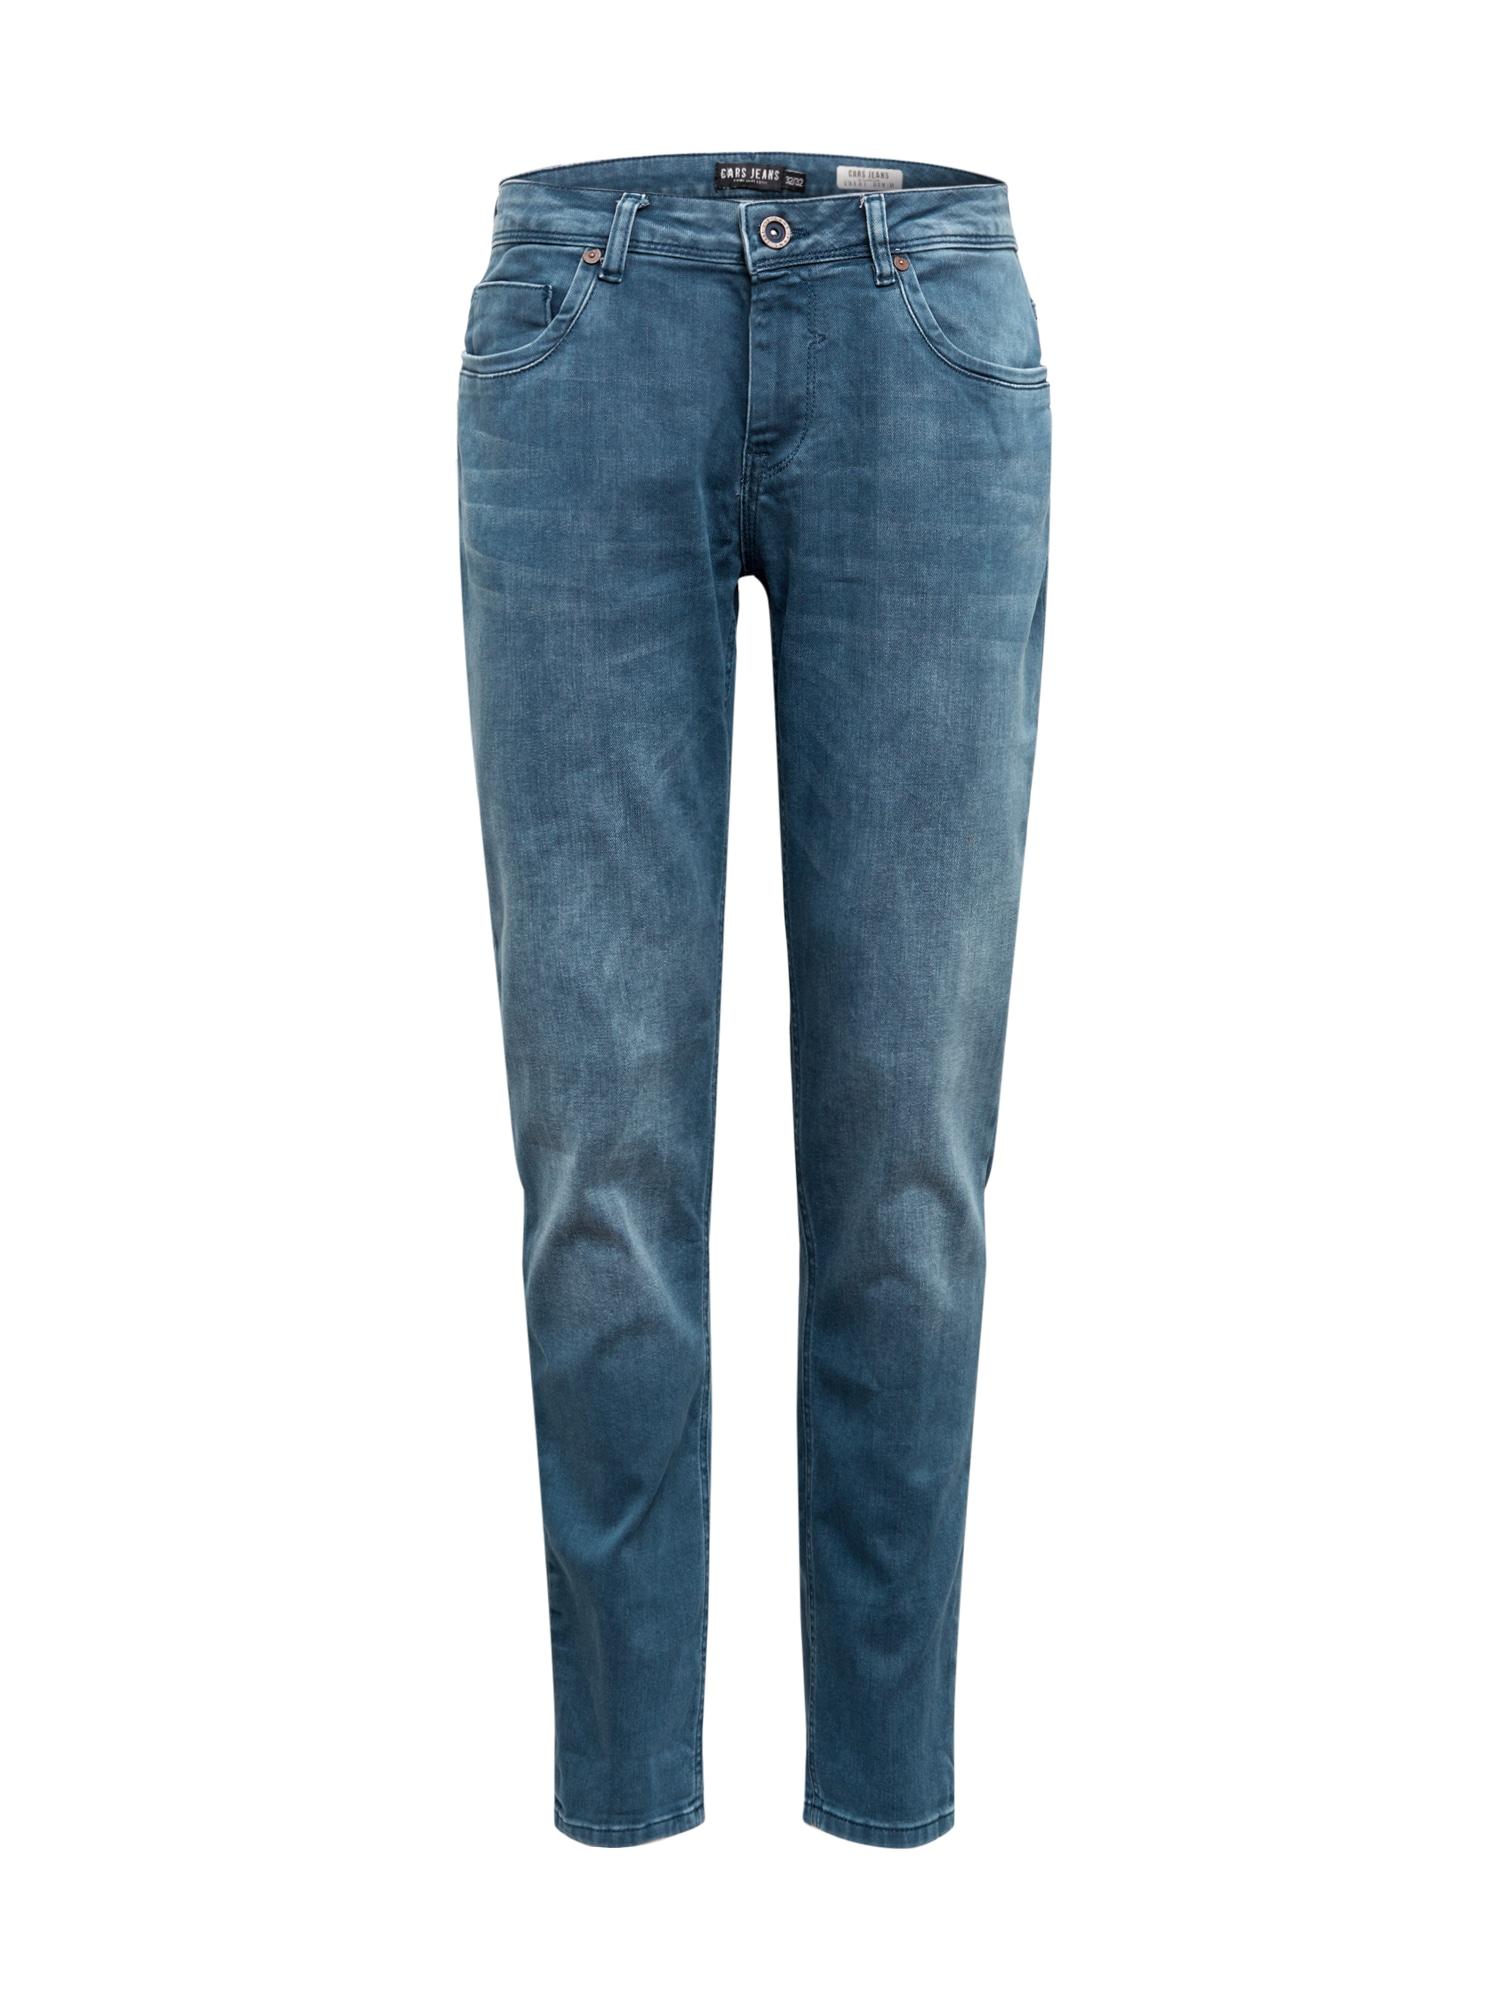 Cars Jeans Džinsai 'THRONE' tamsiai (džinso) mėlyna